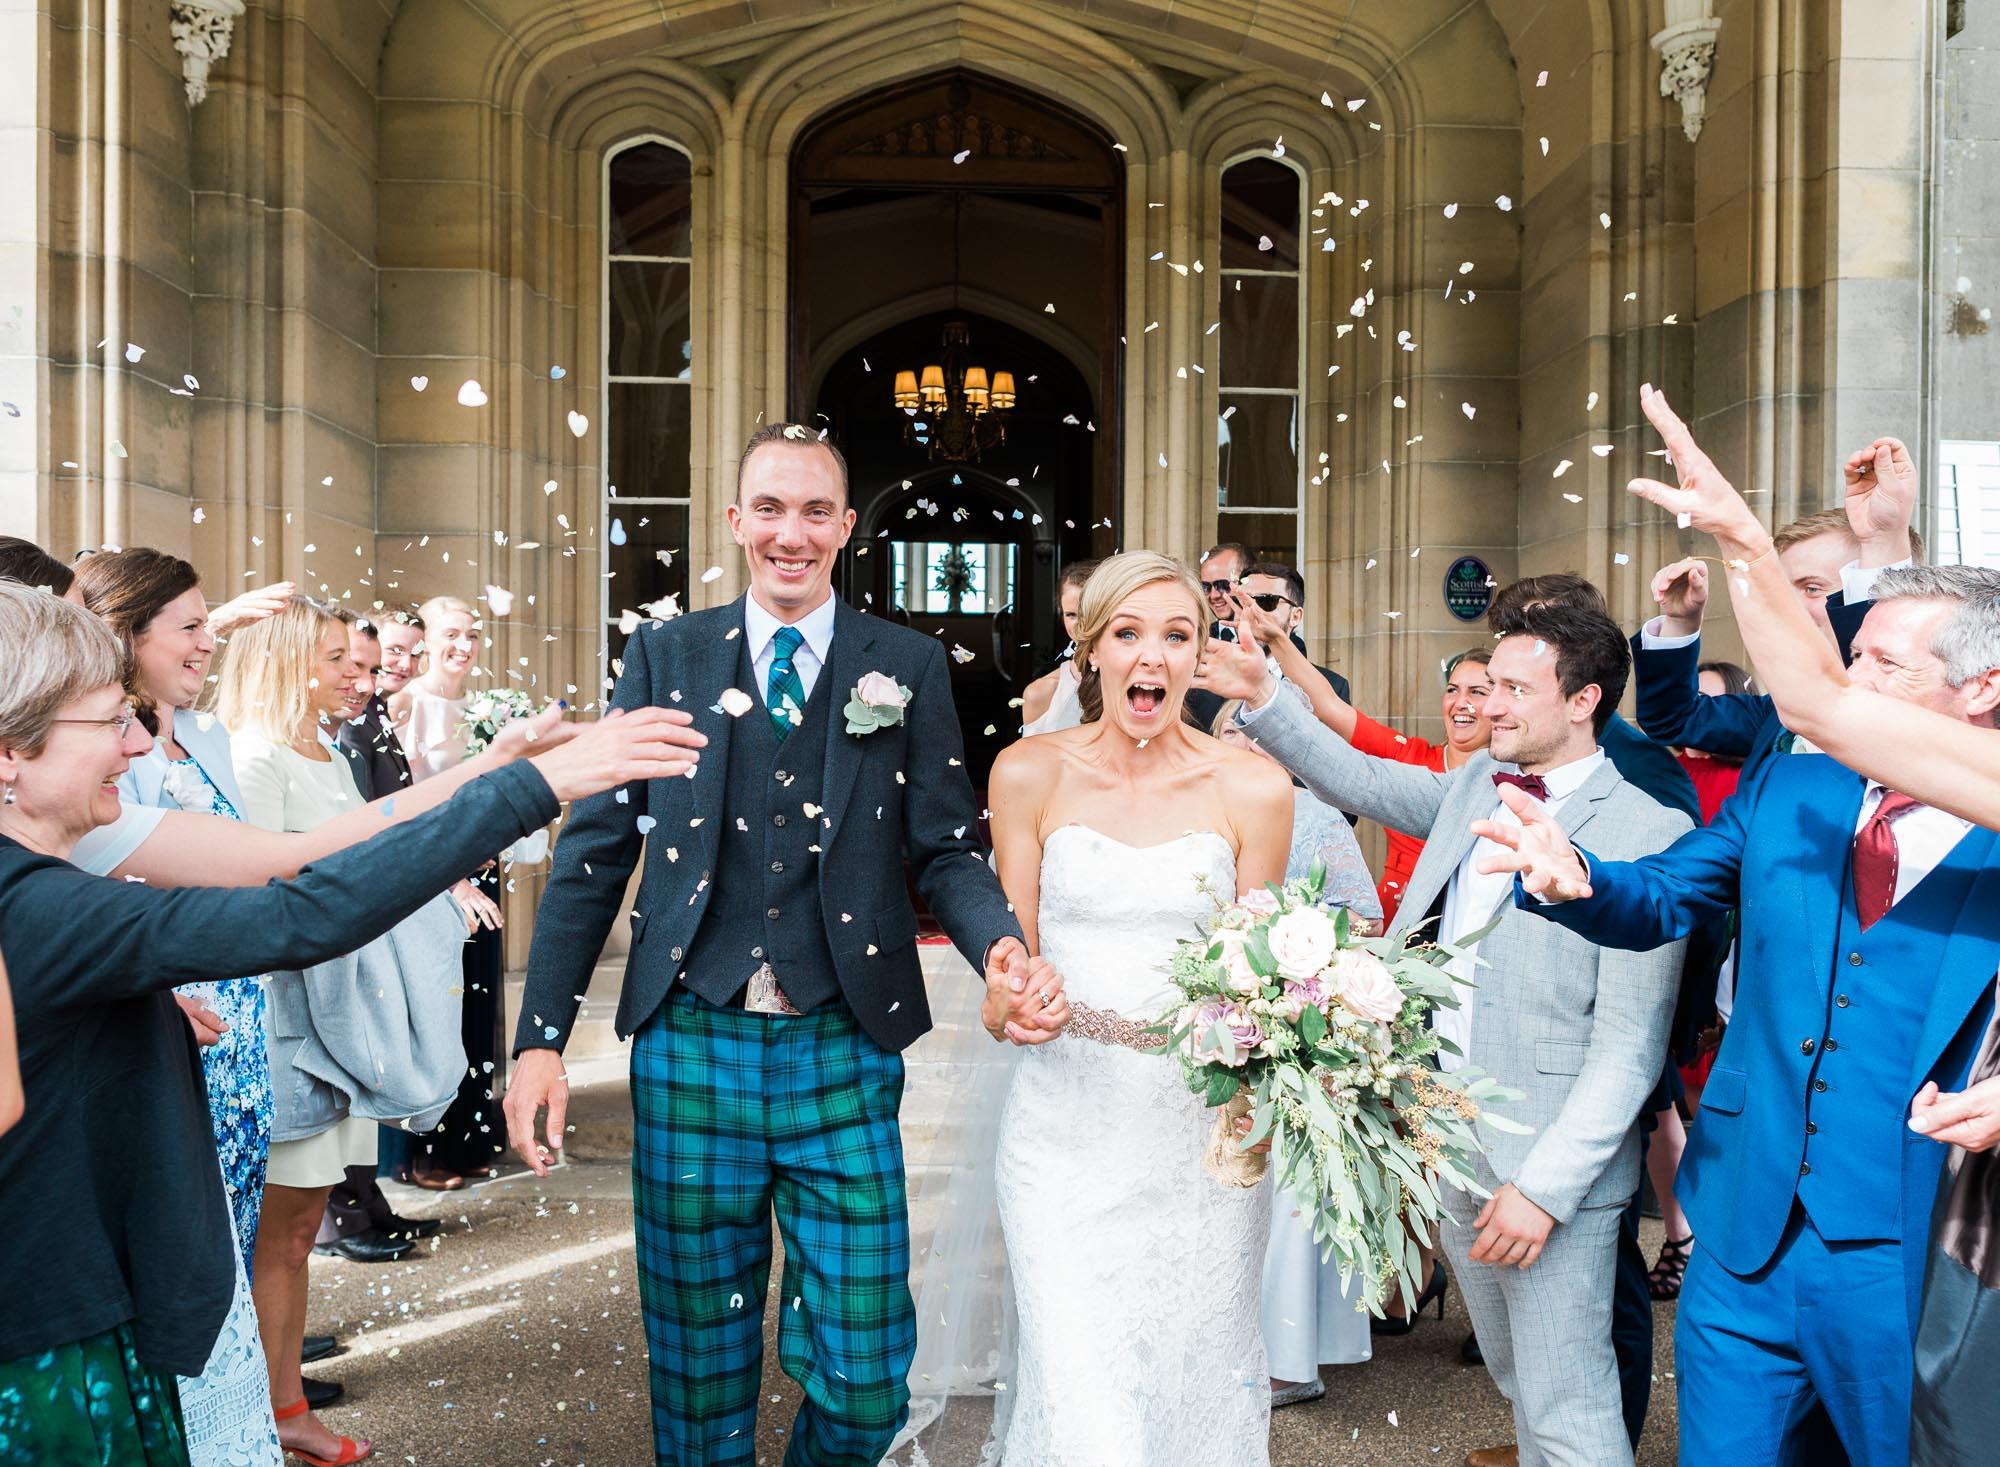 scottish_wedding_blairquhan_castle-70.jpg